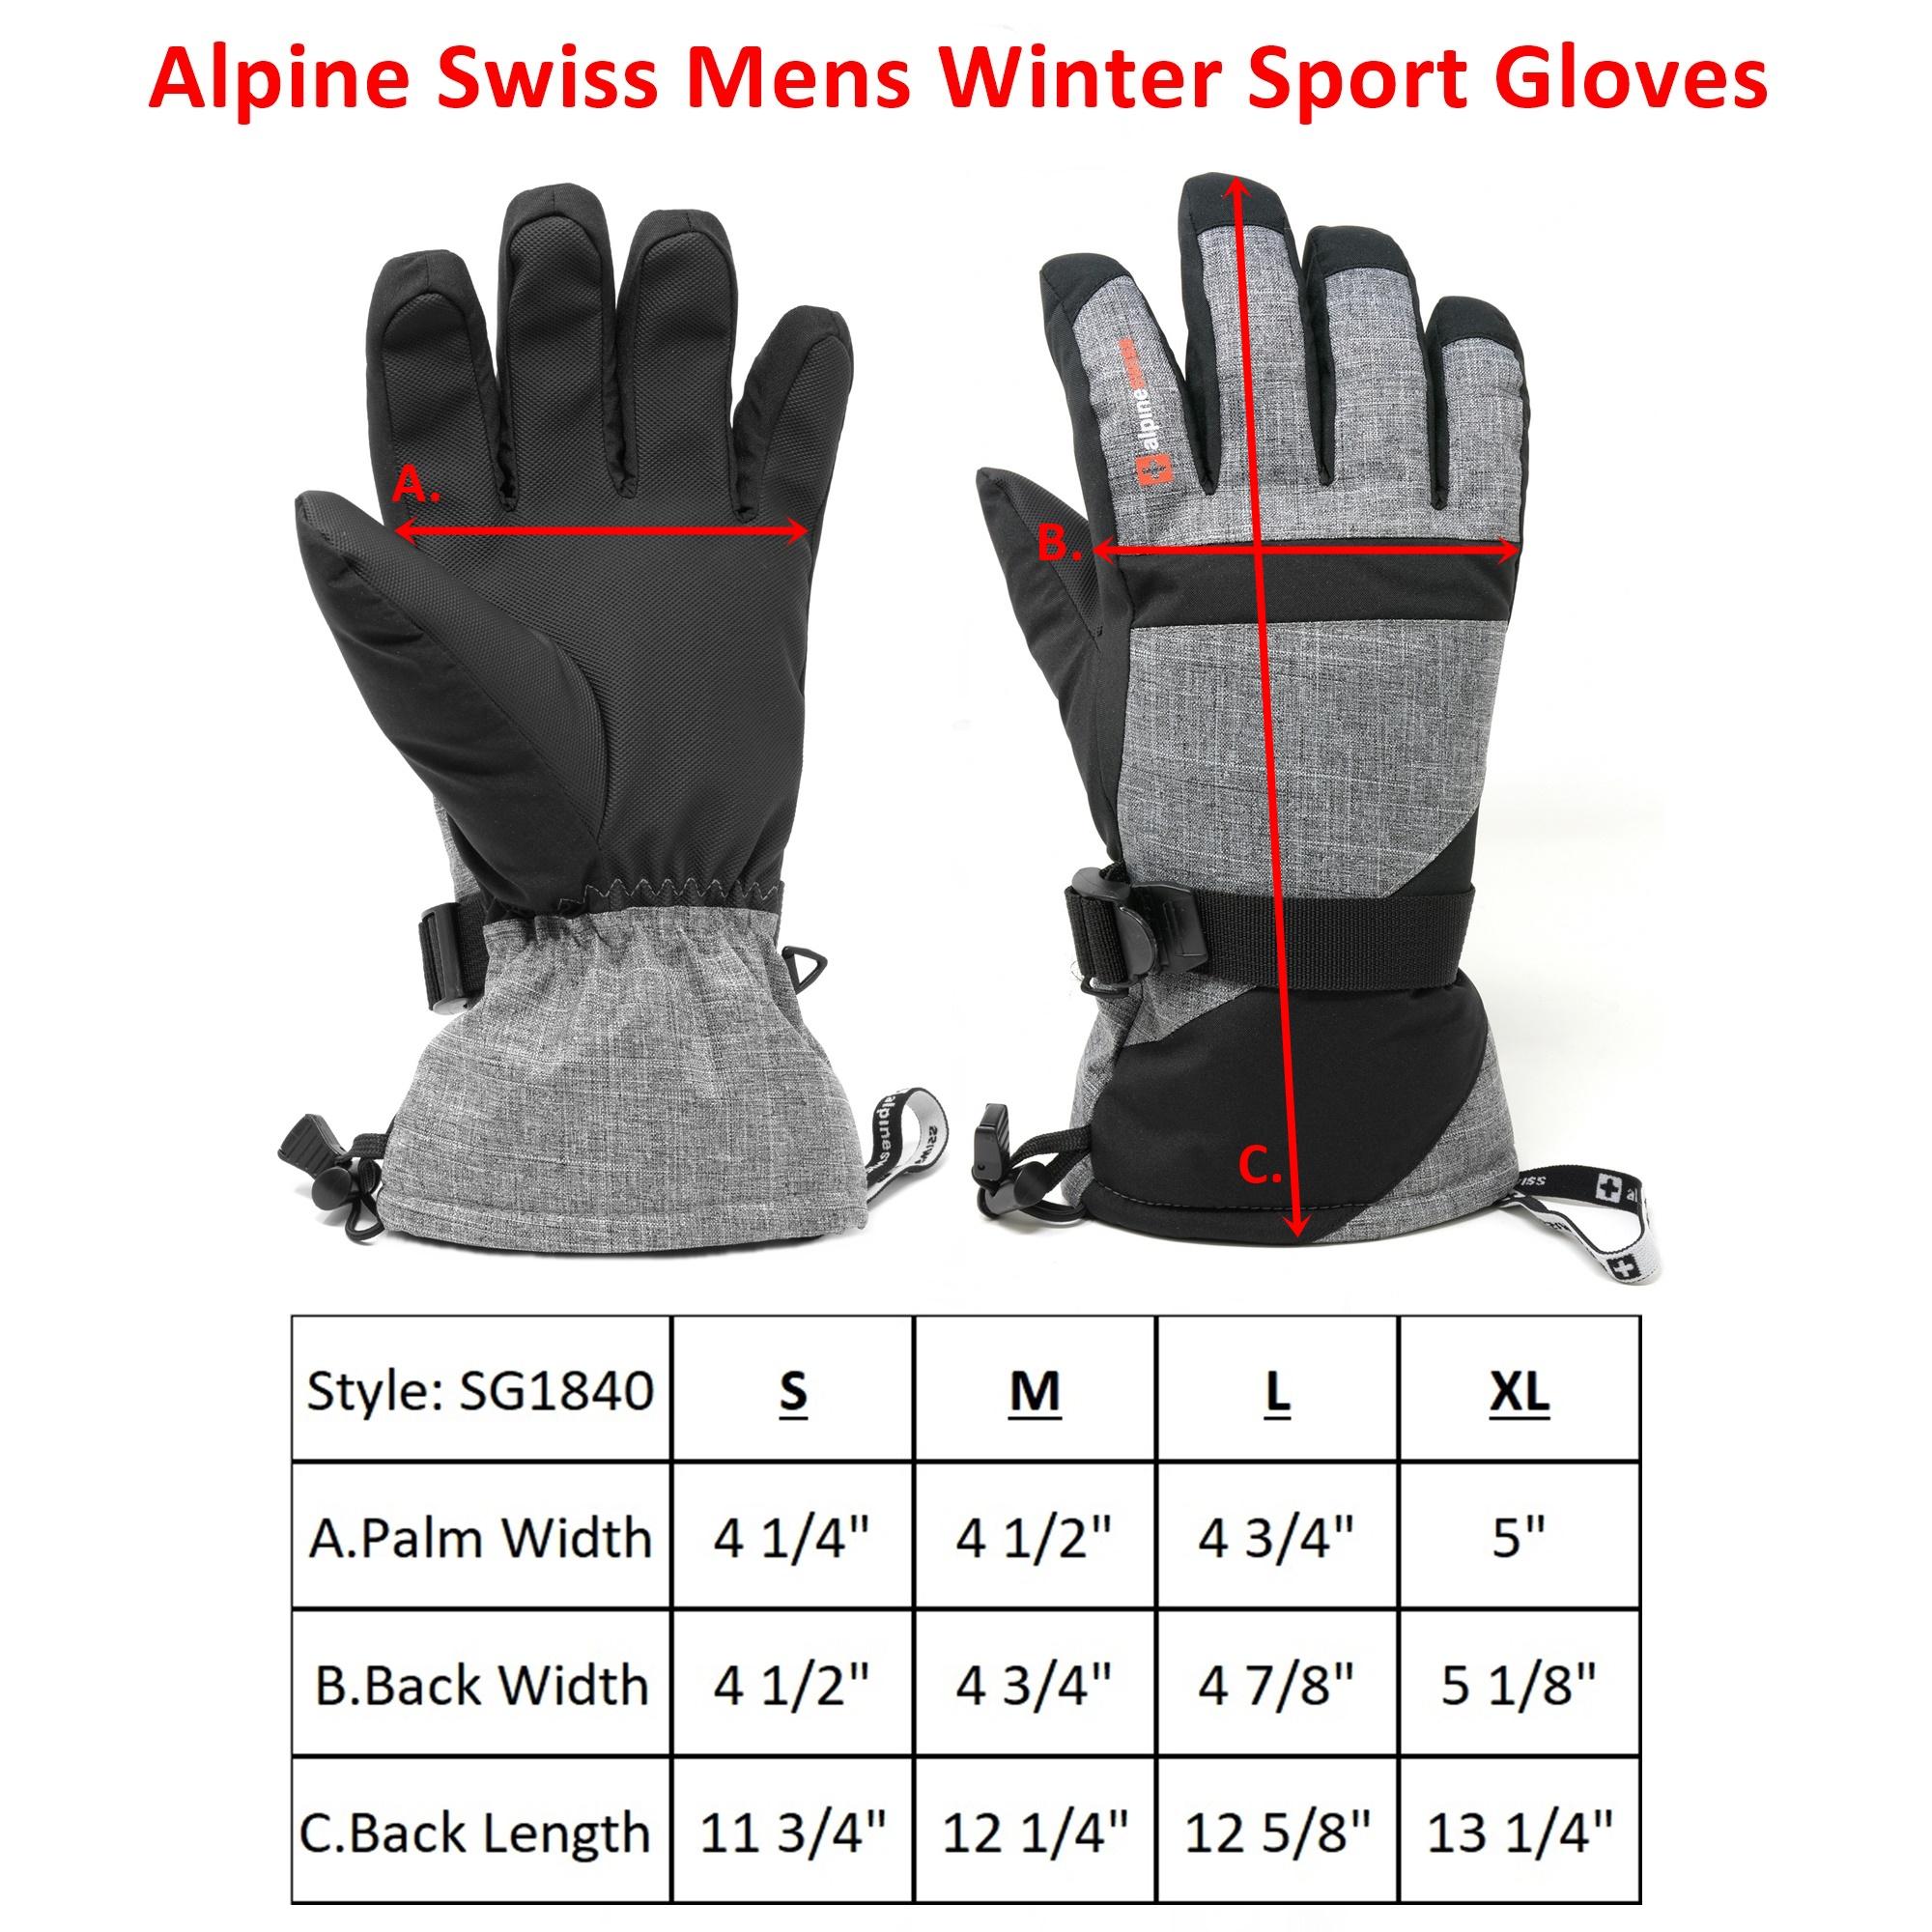 Alpine-Swiss-Mens-Waterproof-Ski-Gloves-Snowboarding-3M-Thinsulate-Winter-Gloves thumbnail 13